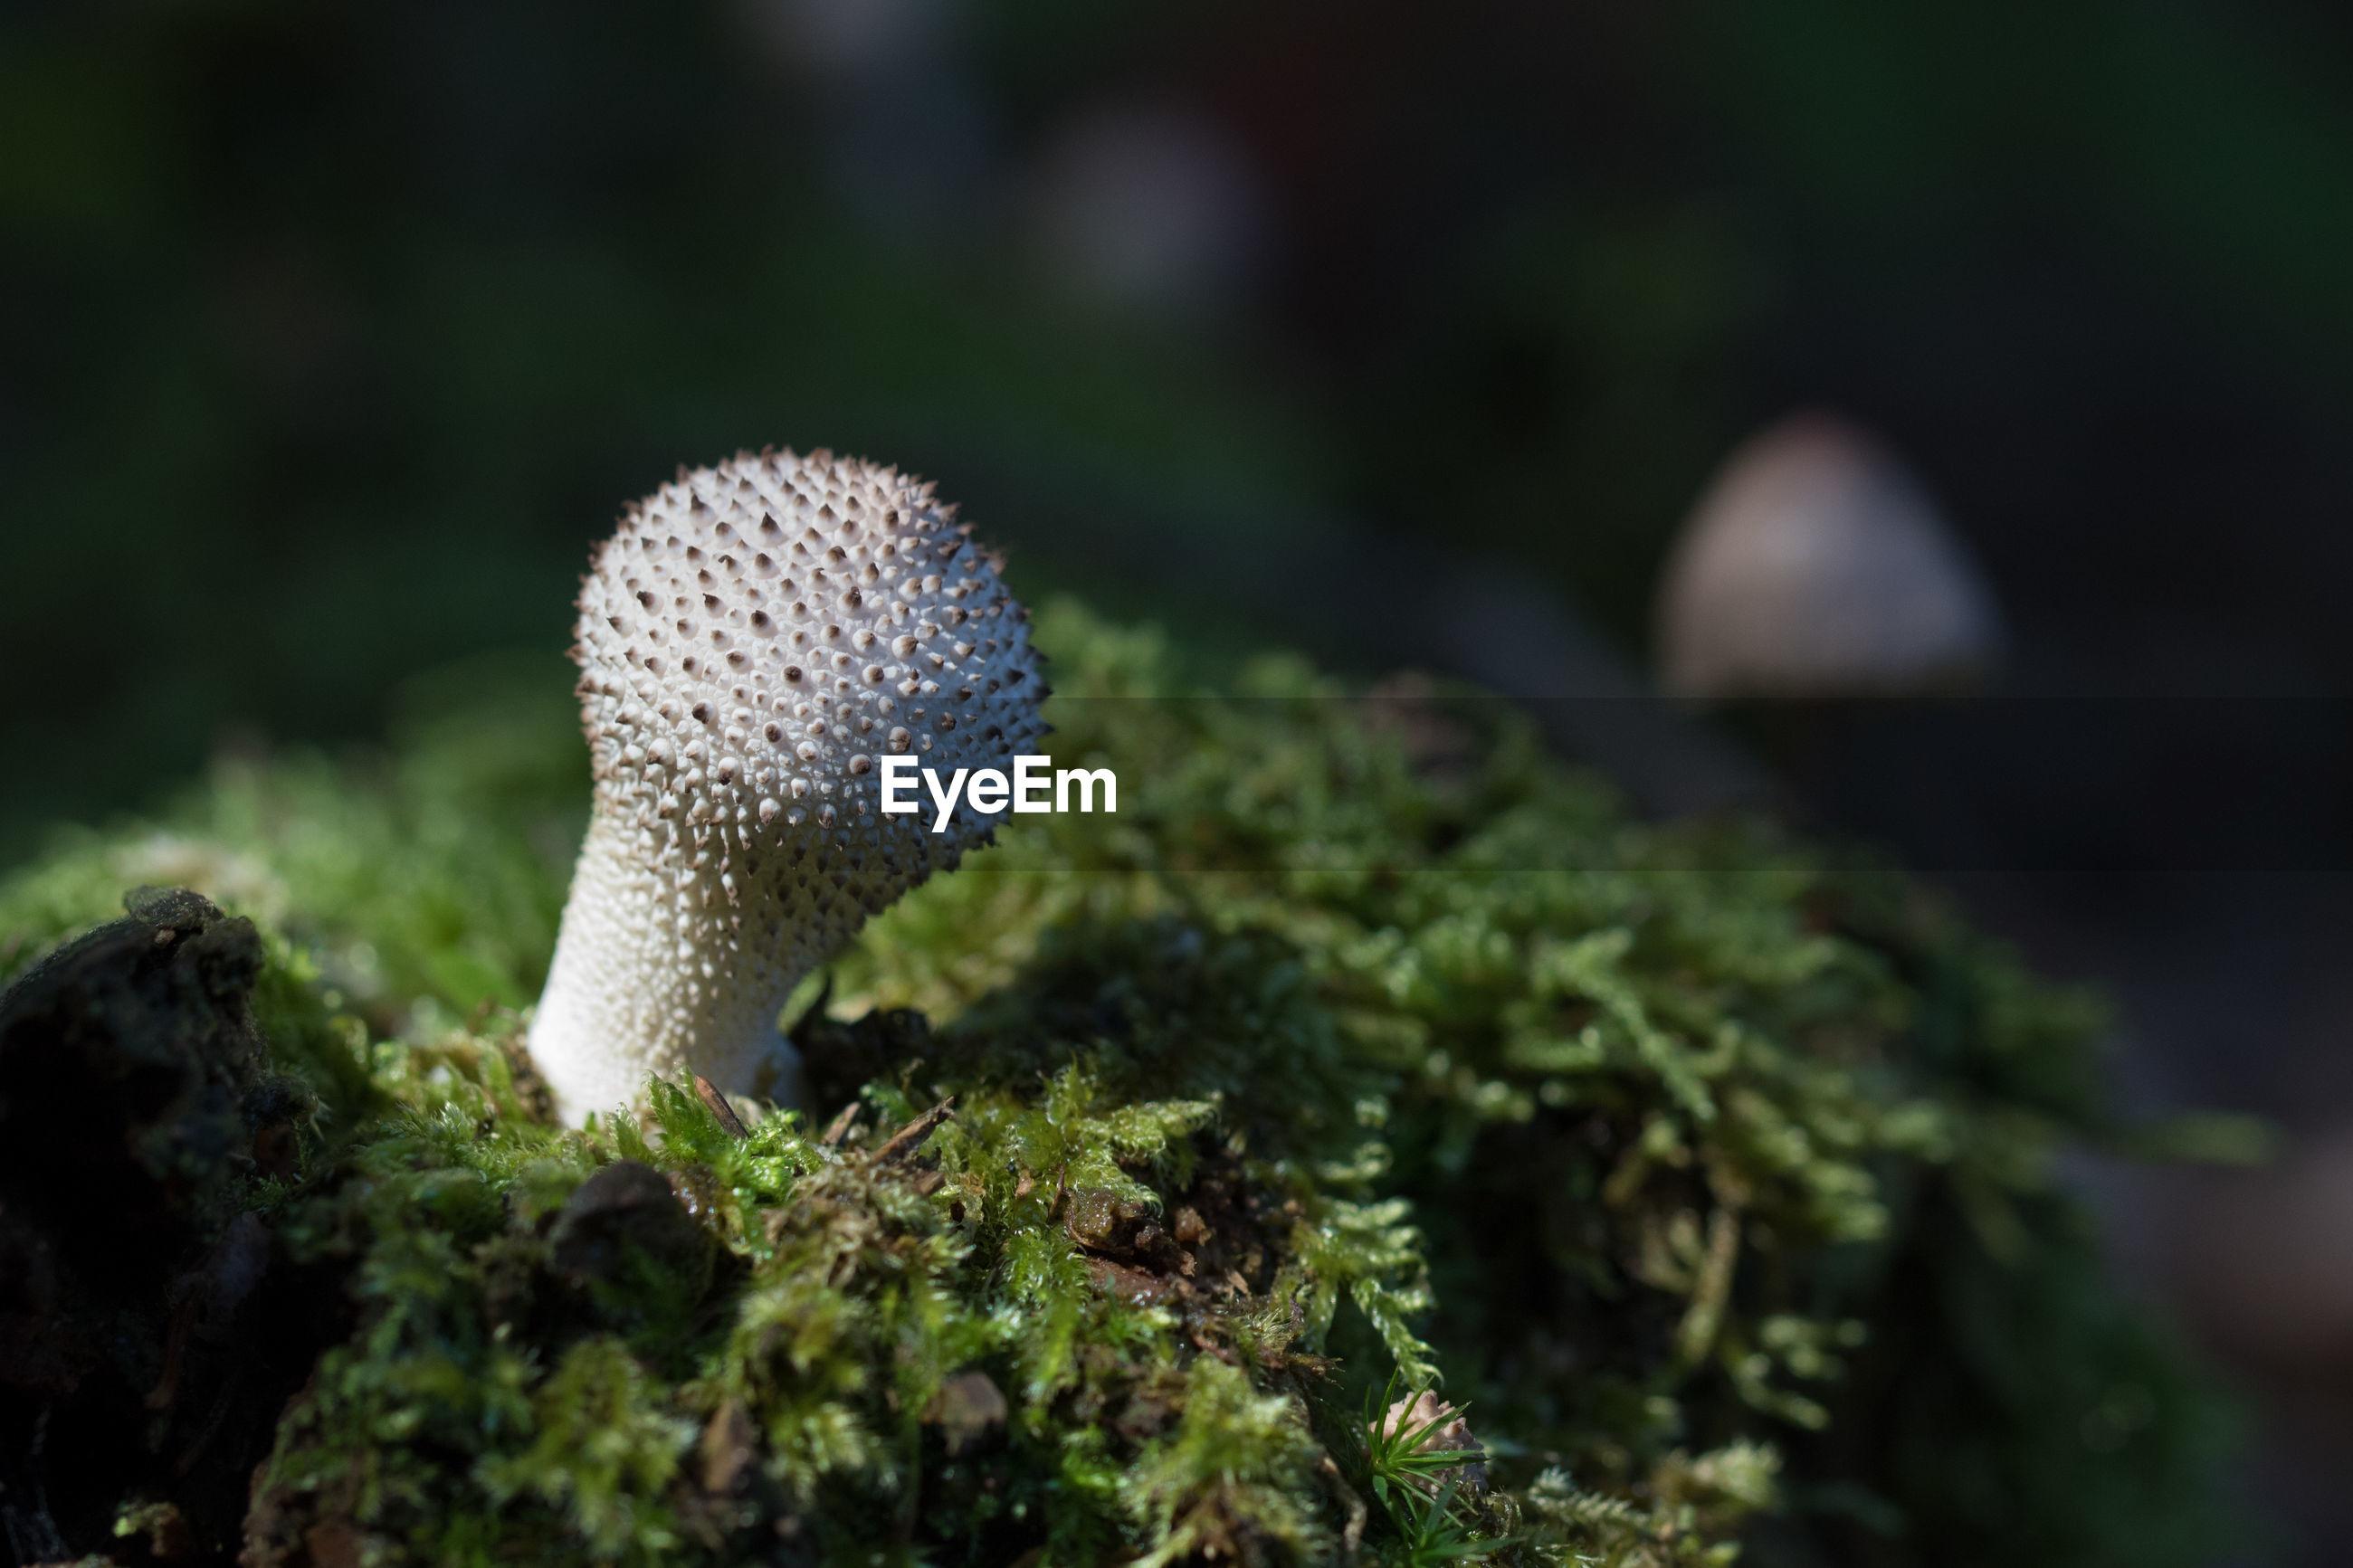 CLOSE-UP OF MUSHROOM GROWING ON PLANT